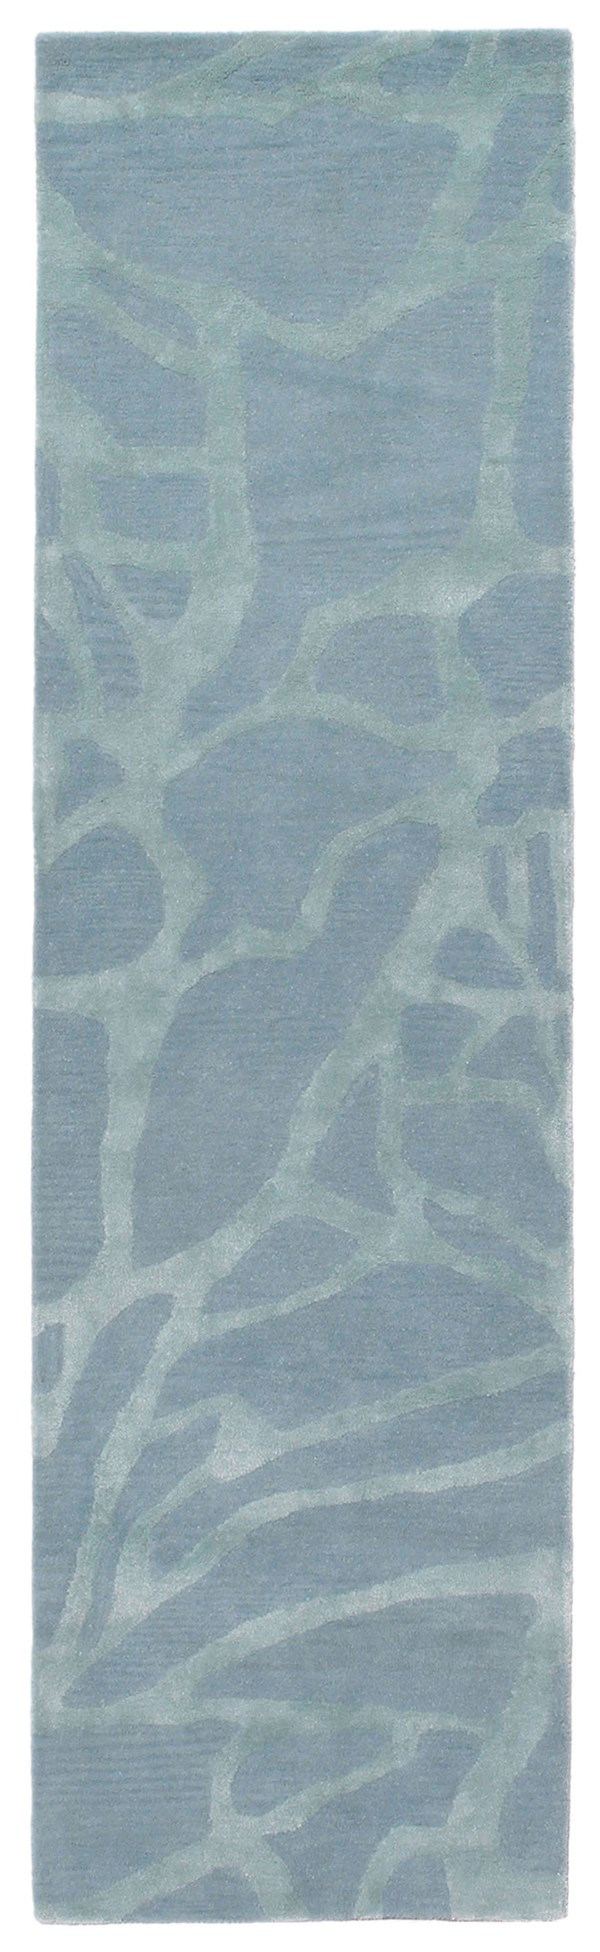 Blue (9303-11) Transitional Area Rug